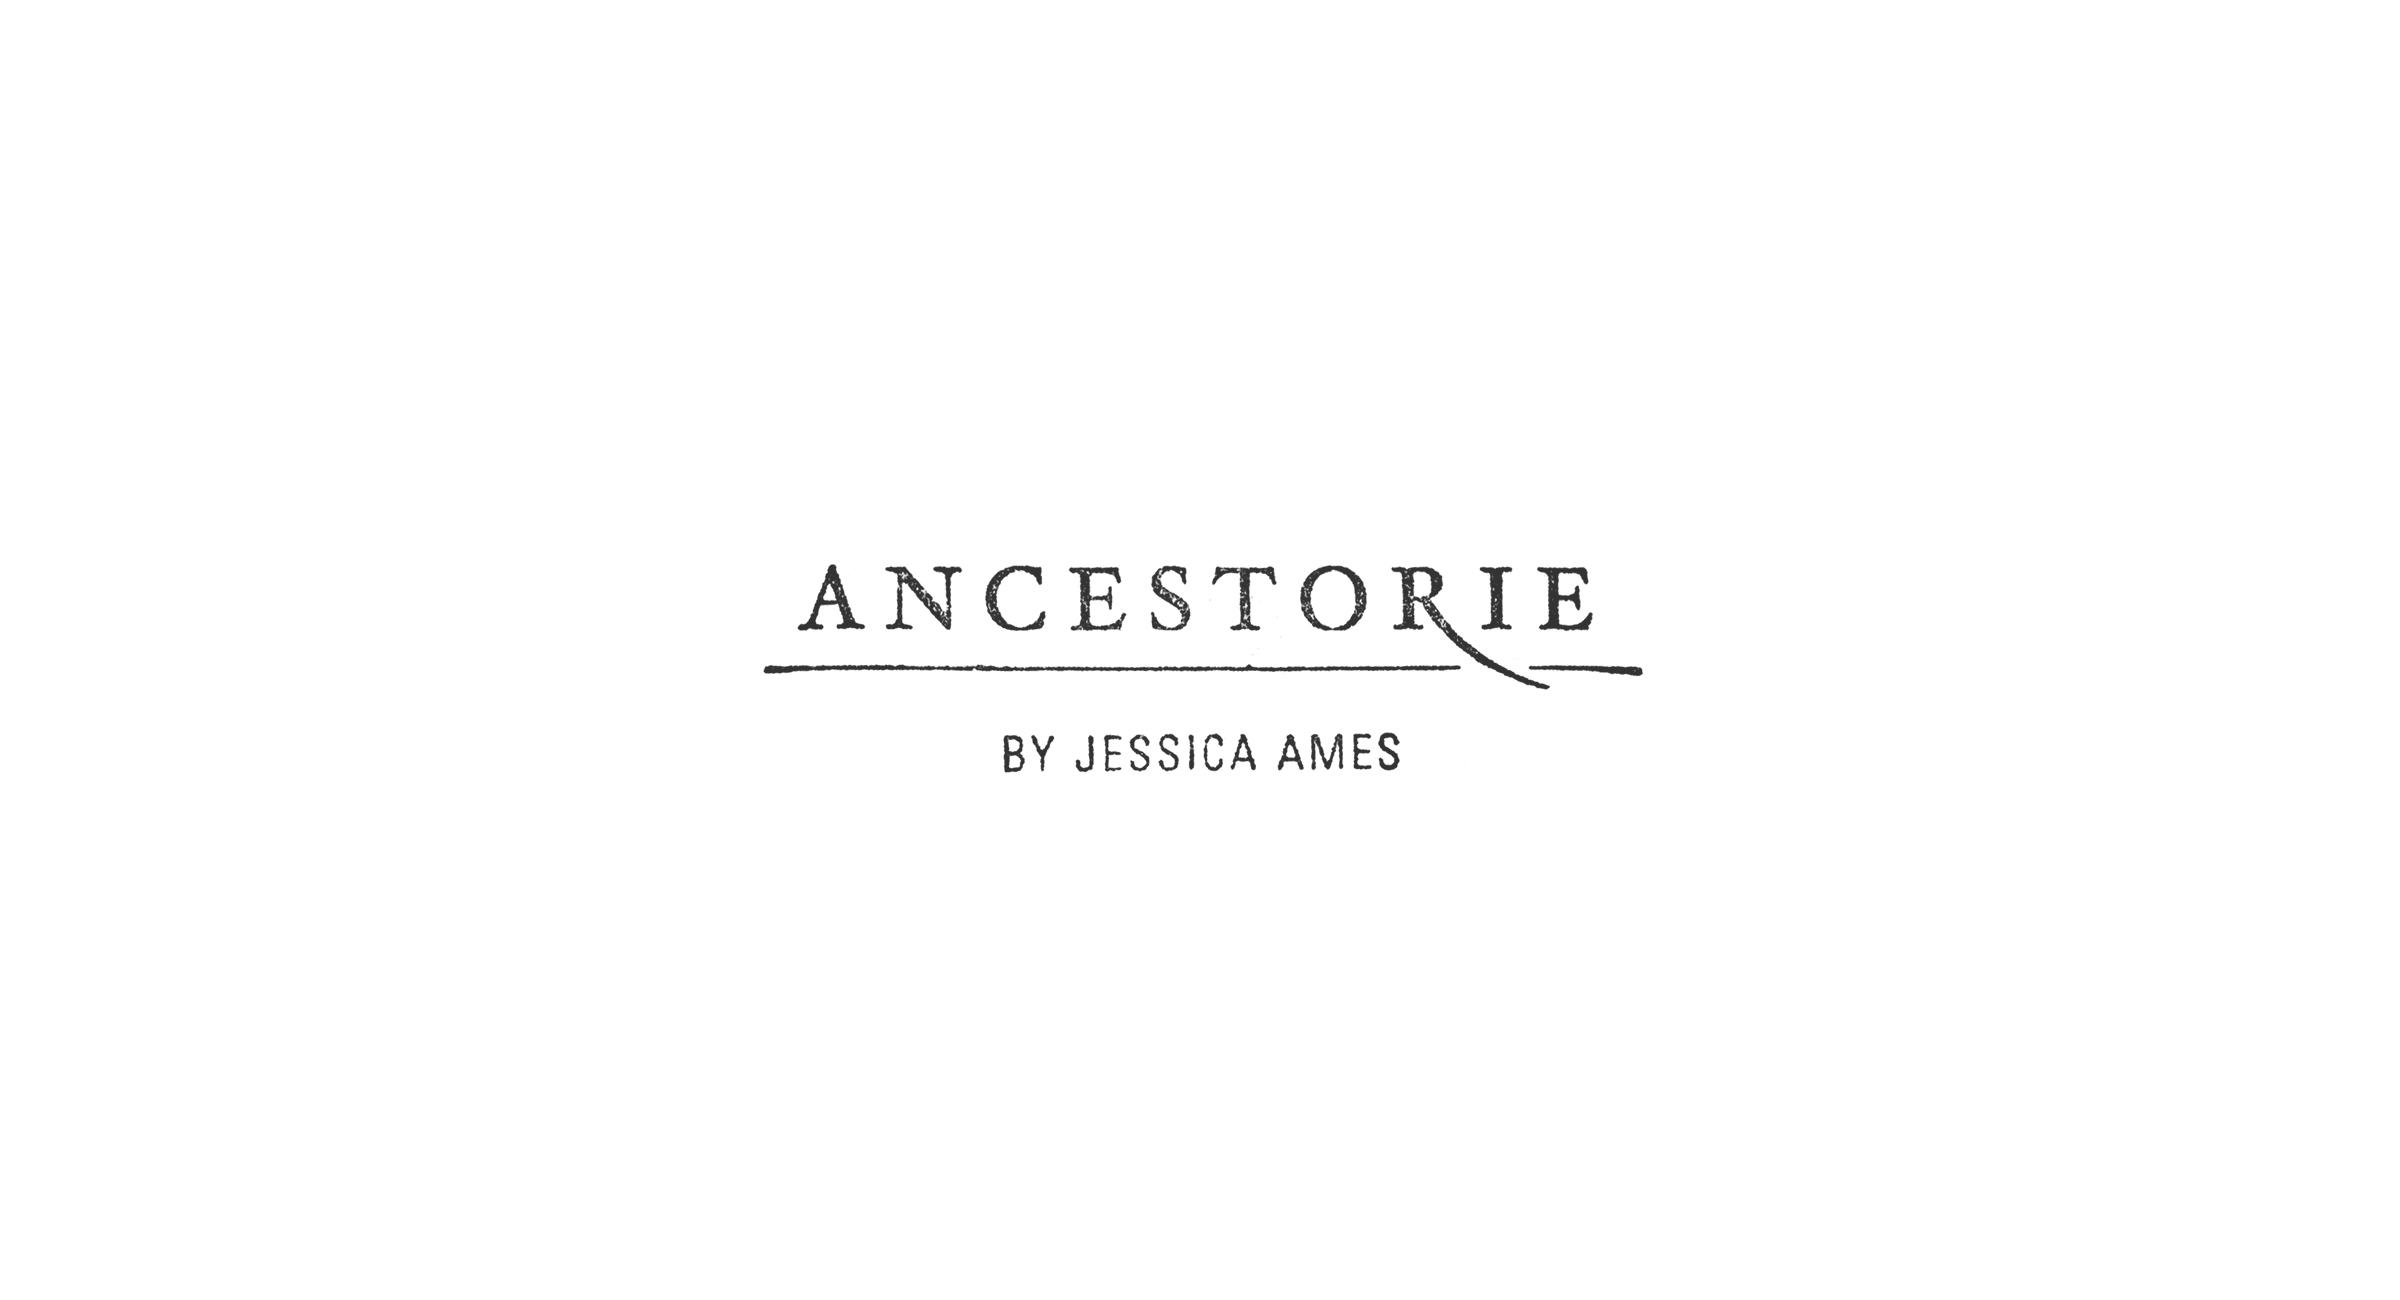 Logo_Branding_Ancestorie_McQuade_Design_1.jpg